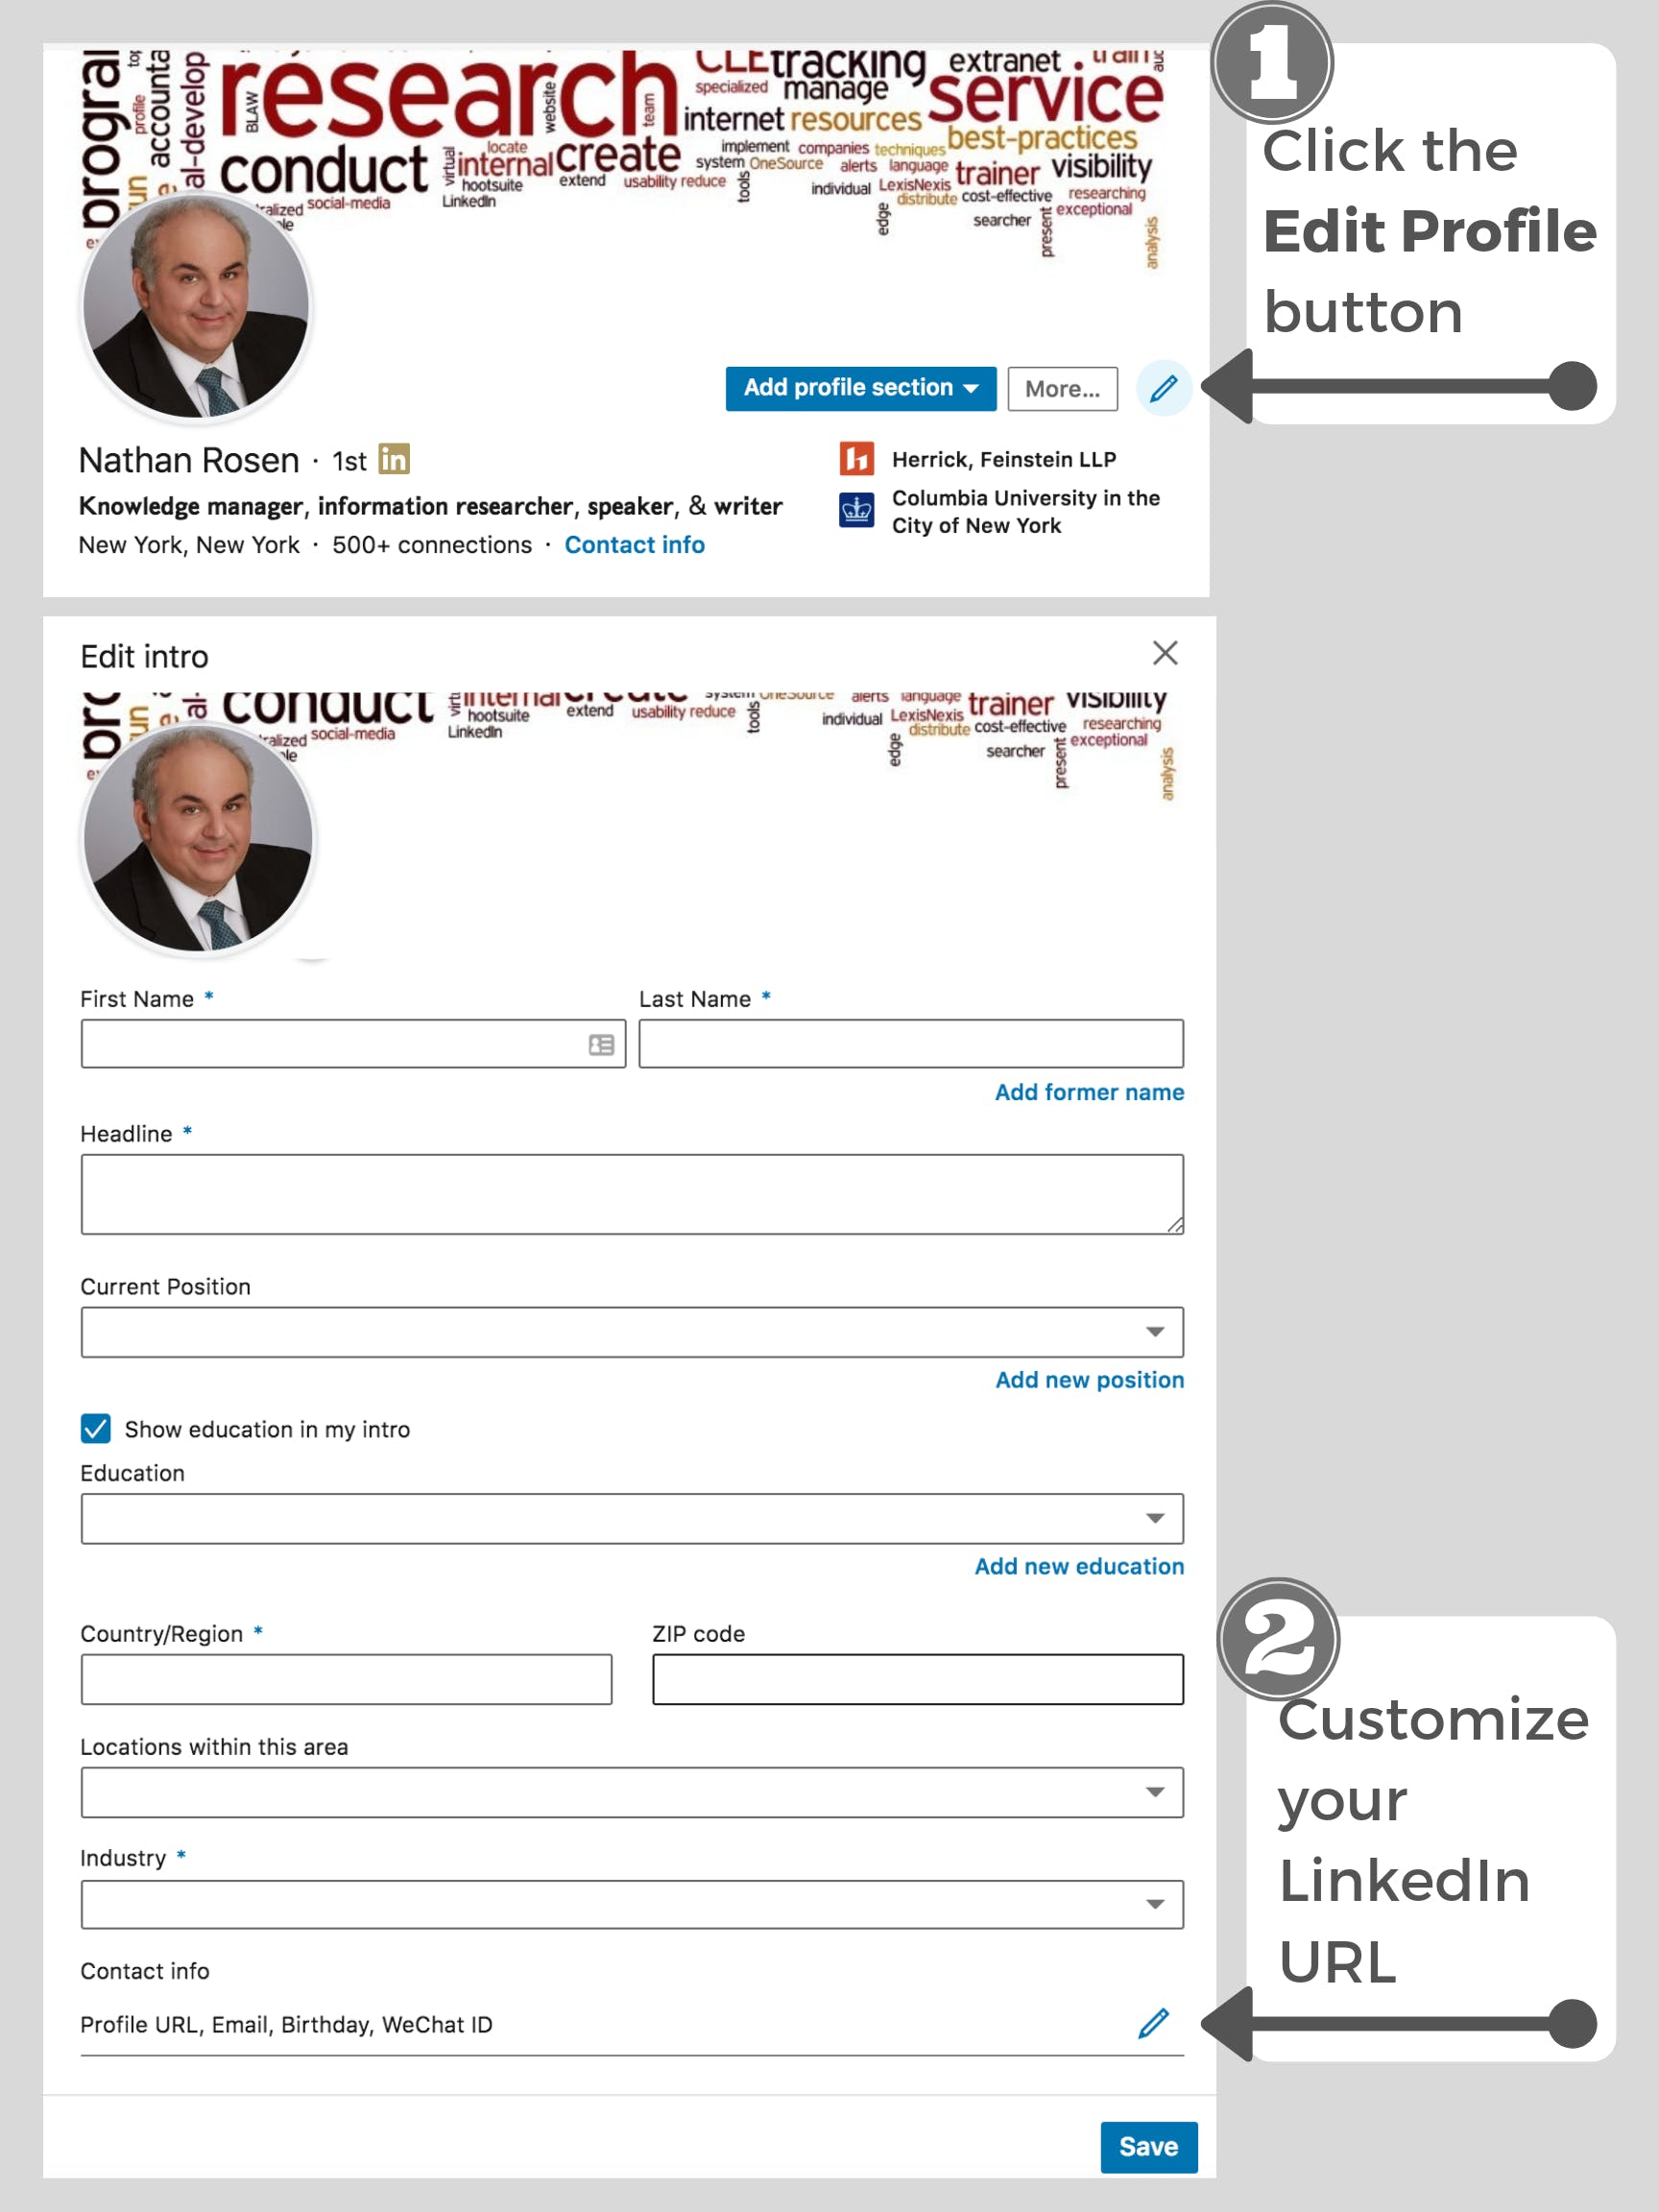 LinkedIn edit URL